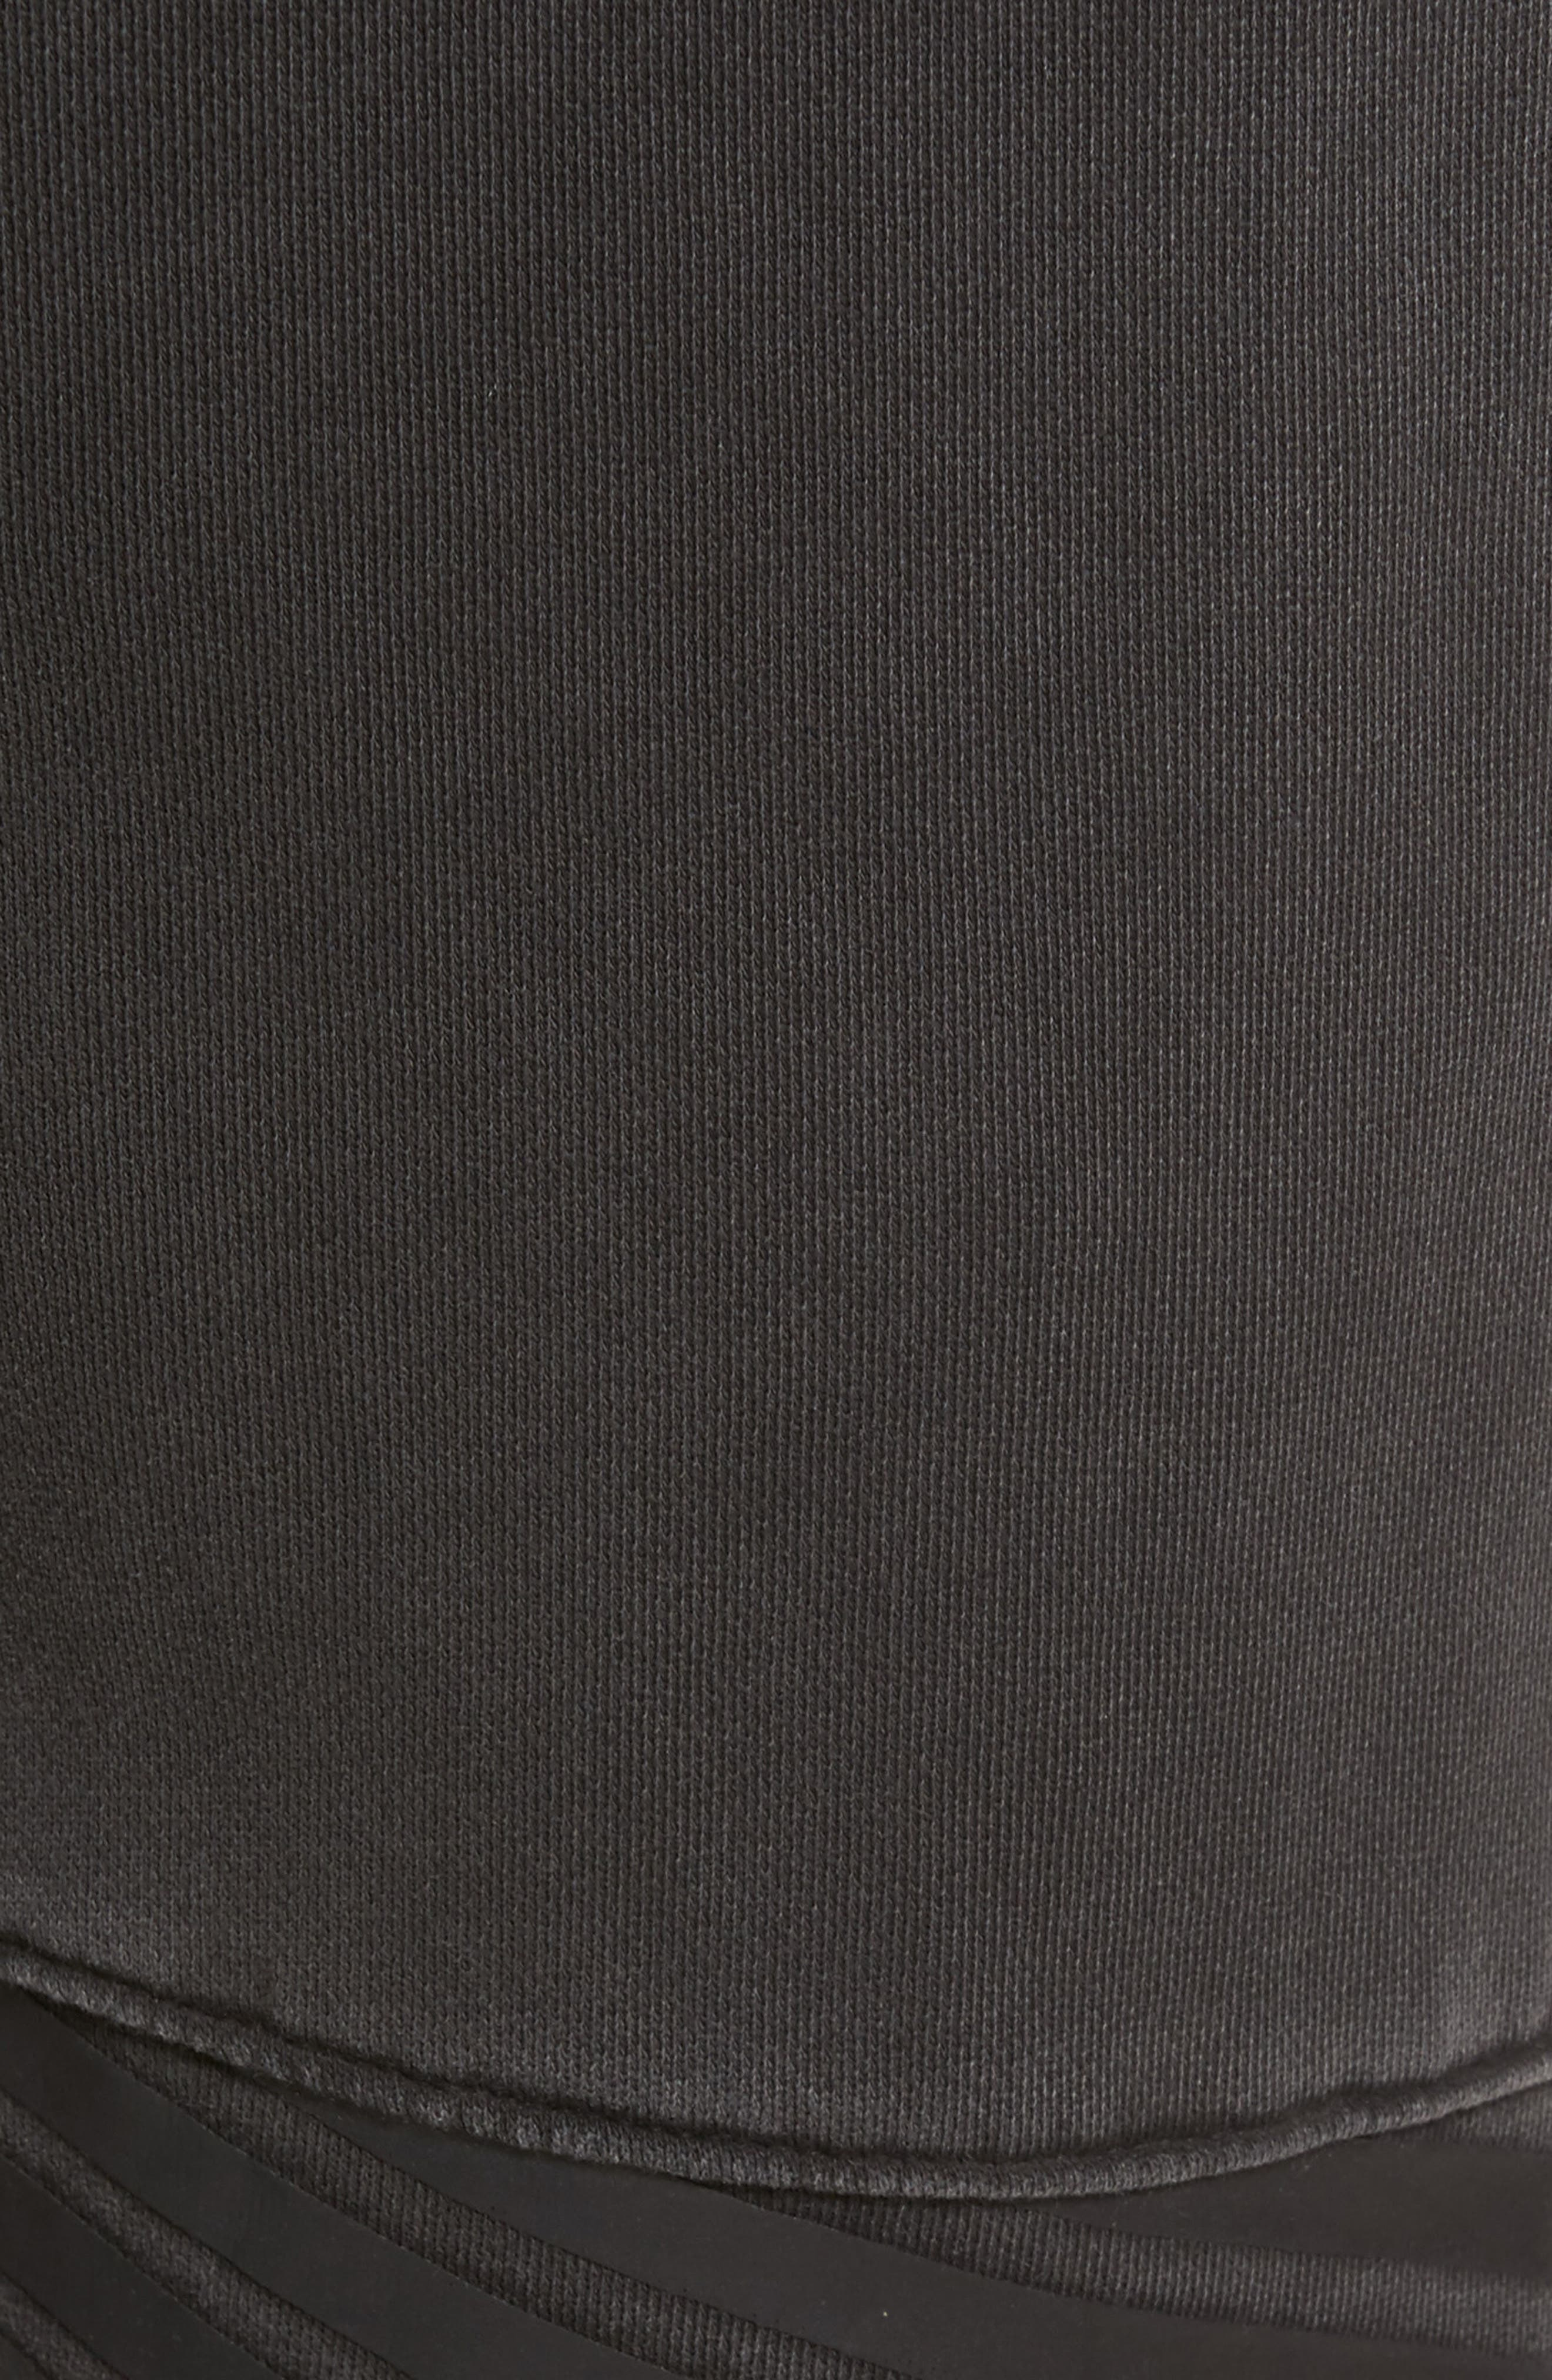 Moto Sweatpants,                             Alternate thumbnail 5, color,                             001